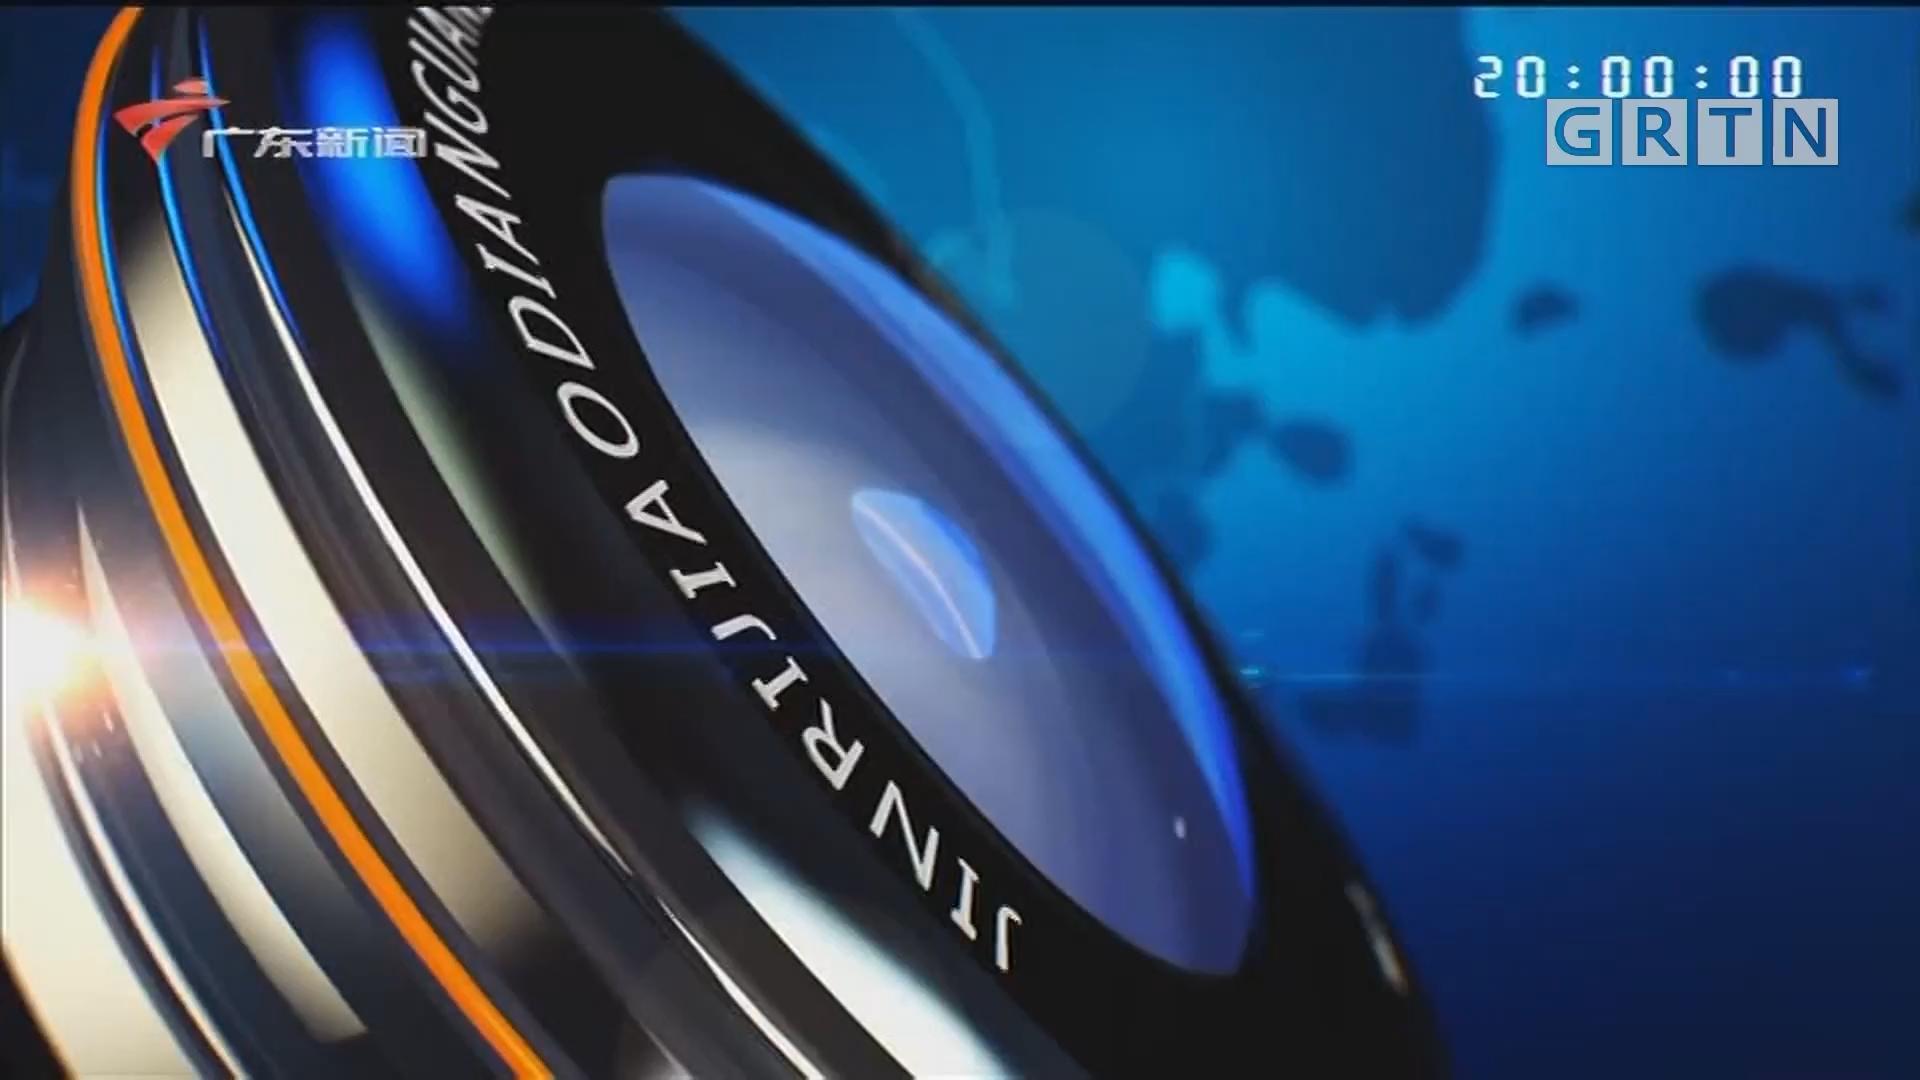 [HD][2019-12-29]今日焦点:珠江调查 湛江:多辆旅游大巴变客运专线 四处揽客